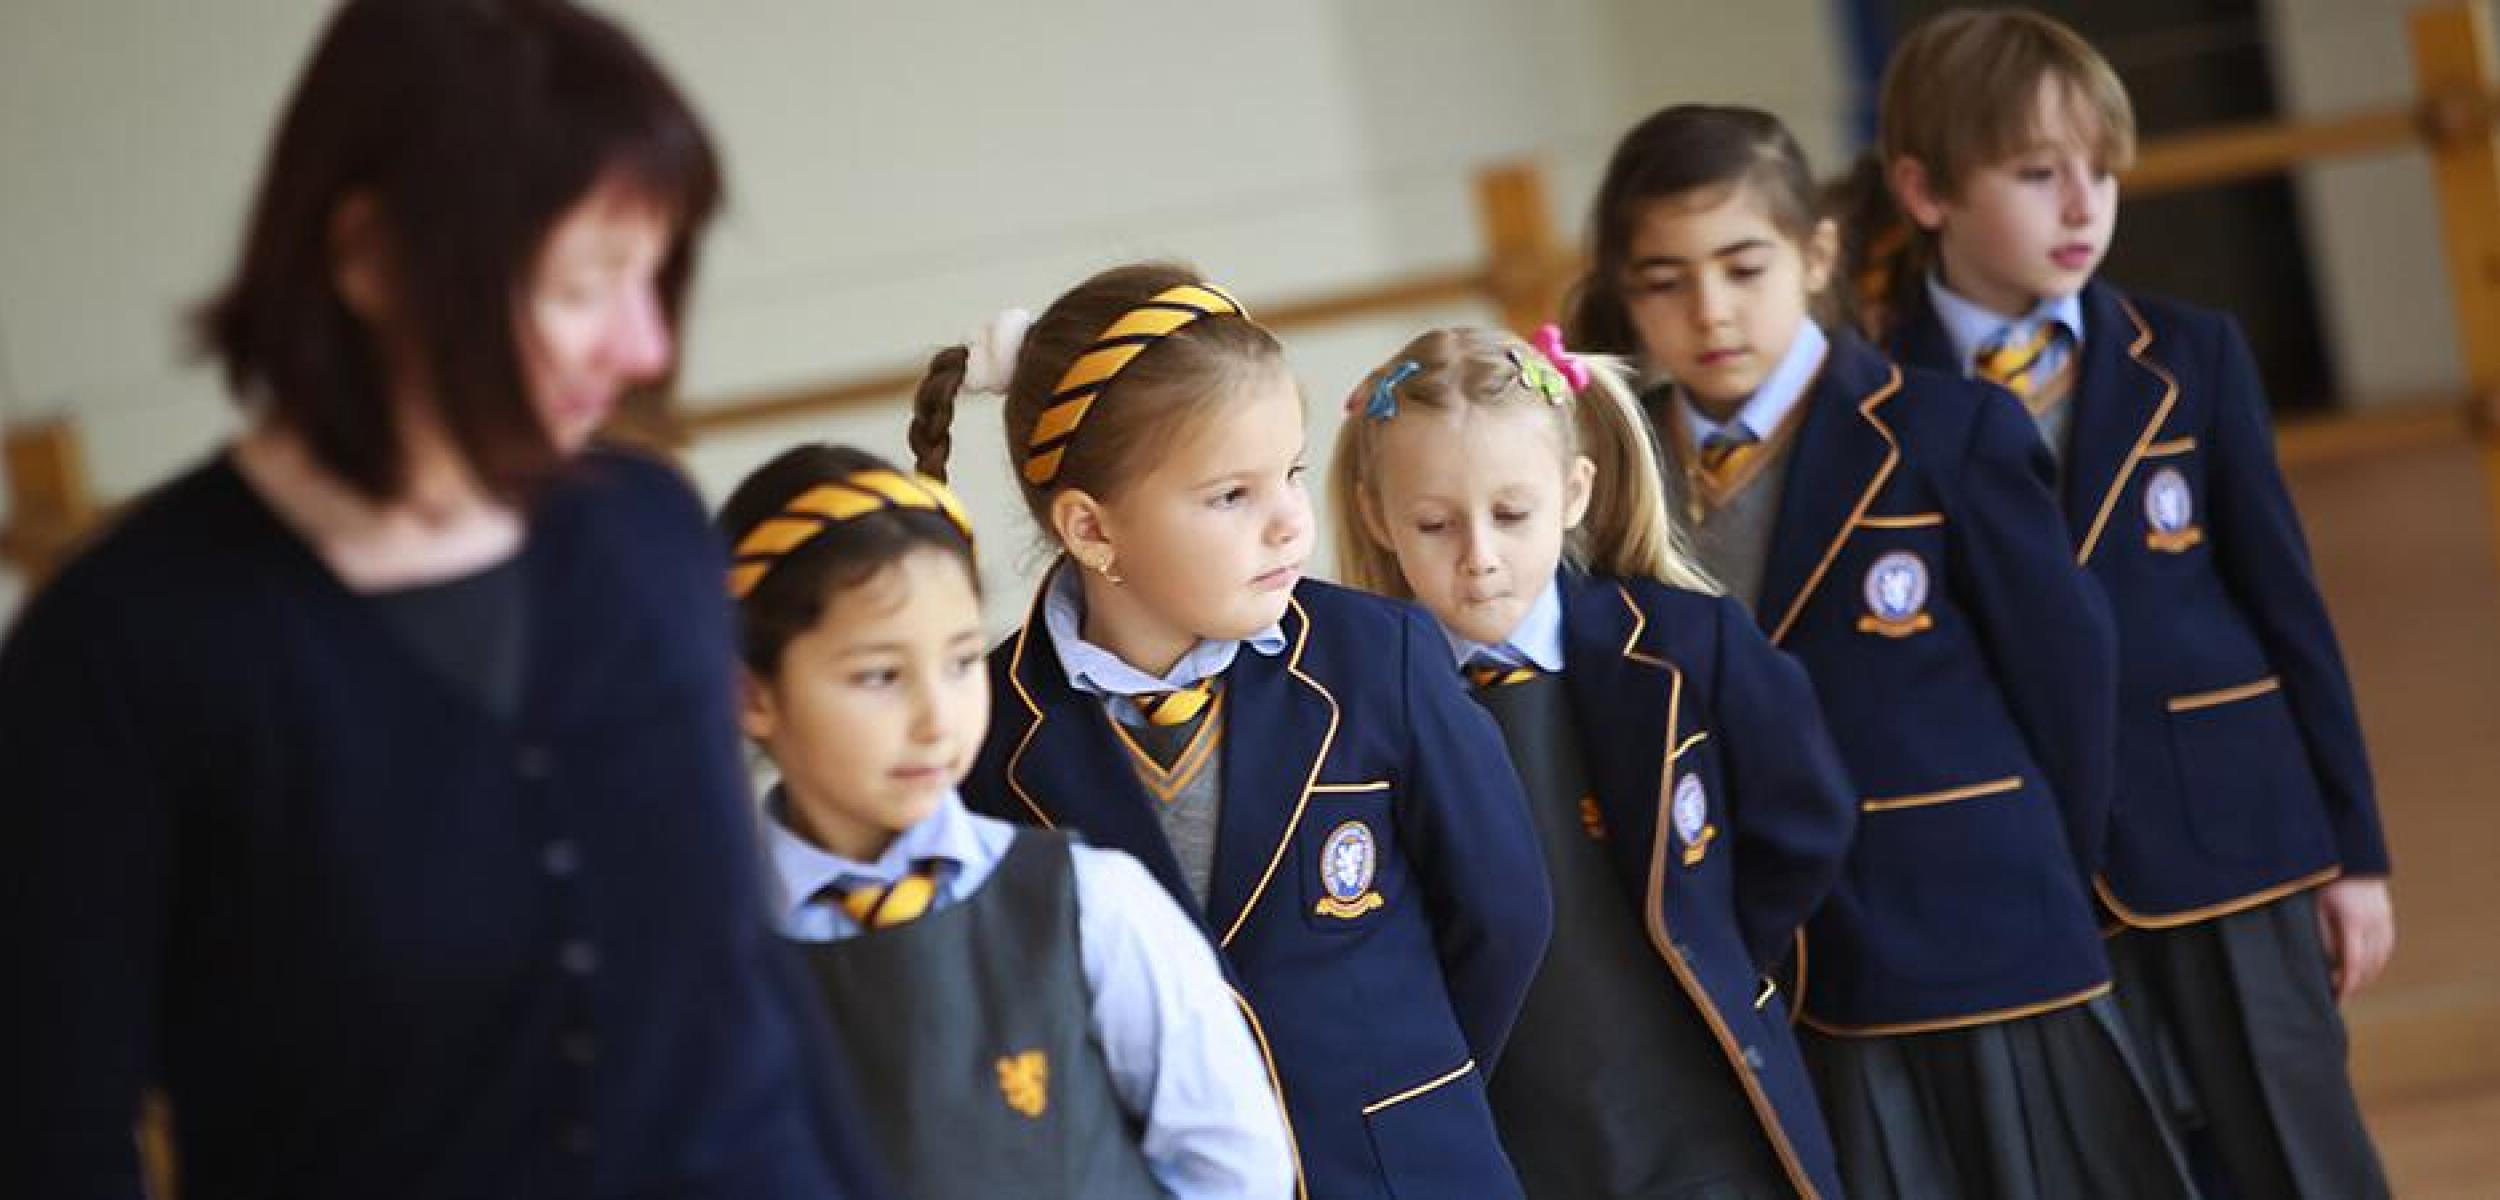 british  girls school uniform  Welcome to The British School of Brasilia